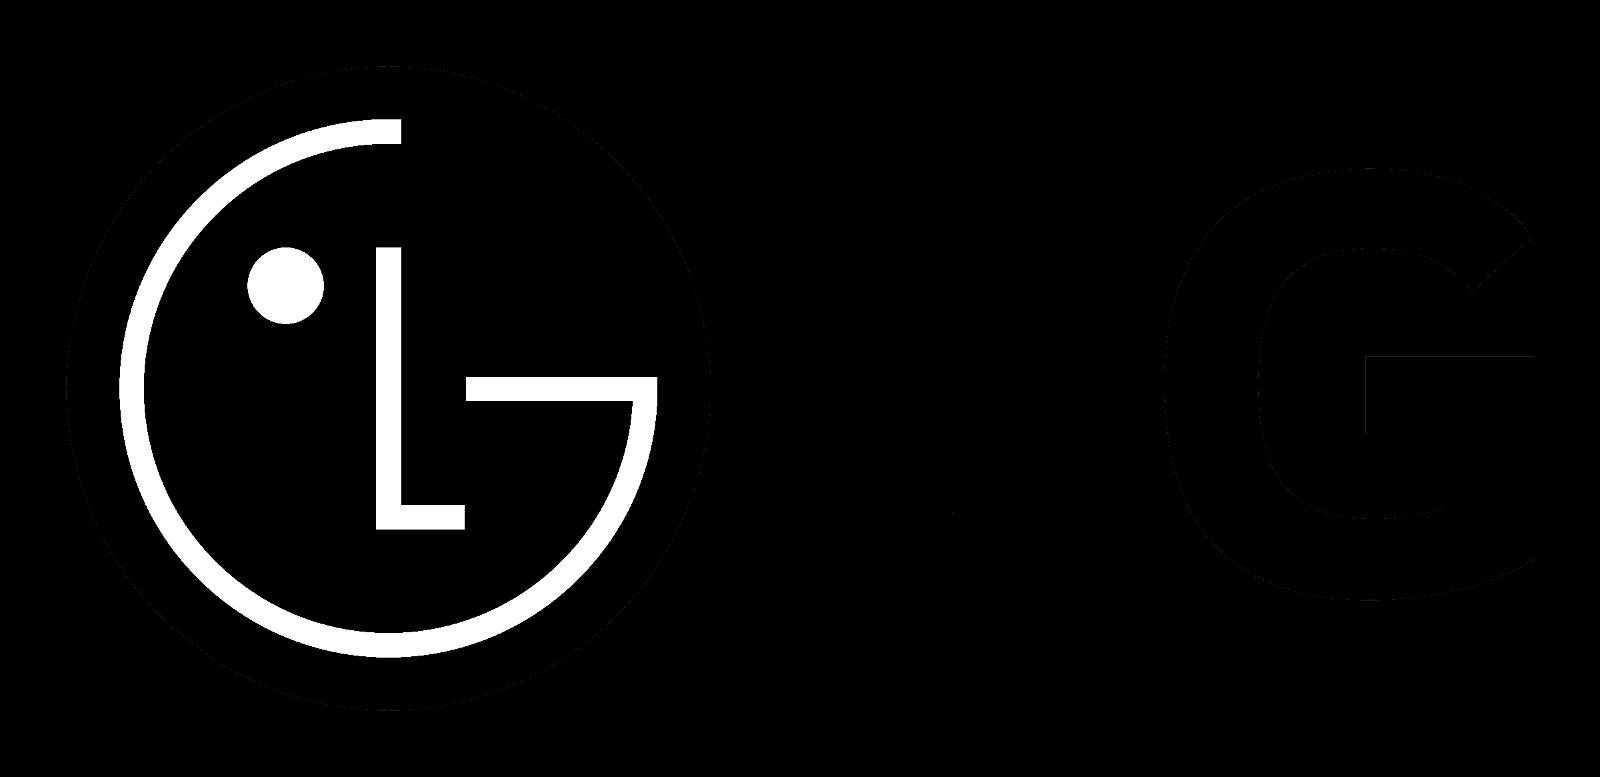 LG V60 5G ThinQ Dual Screen Review 2